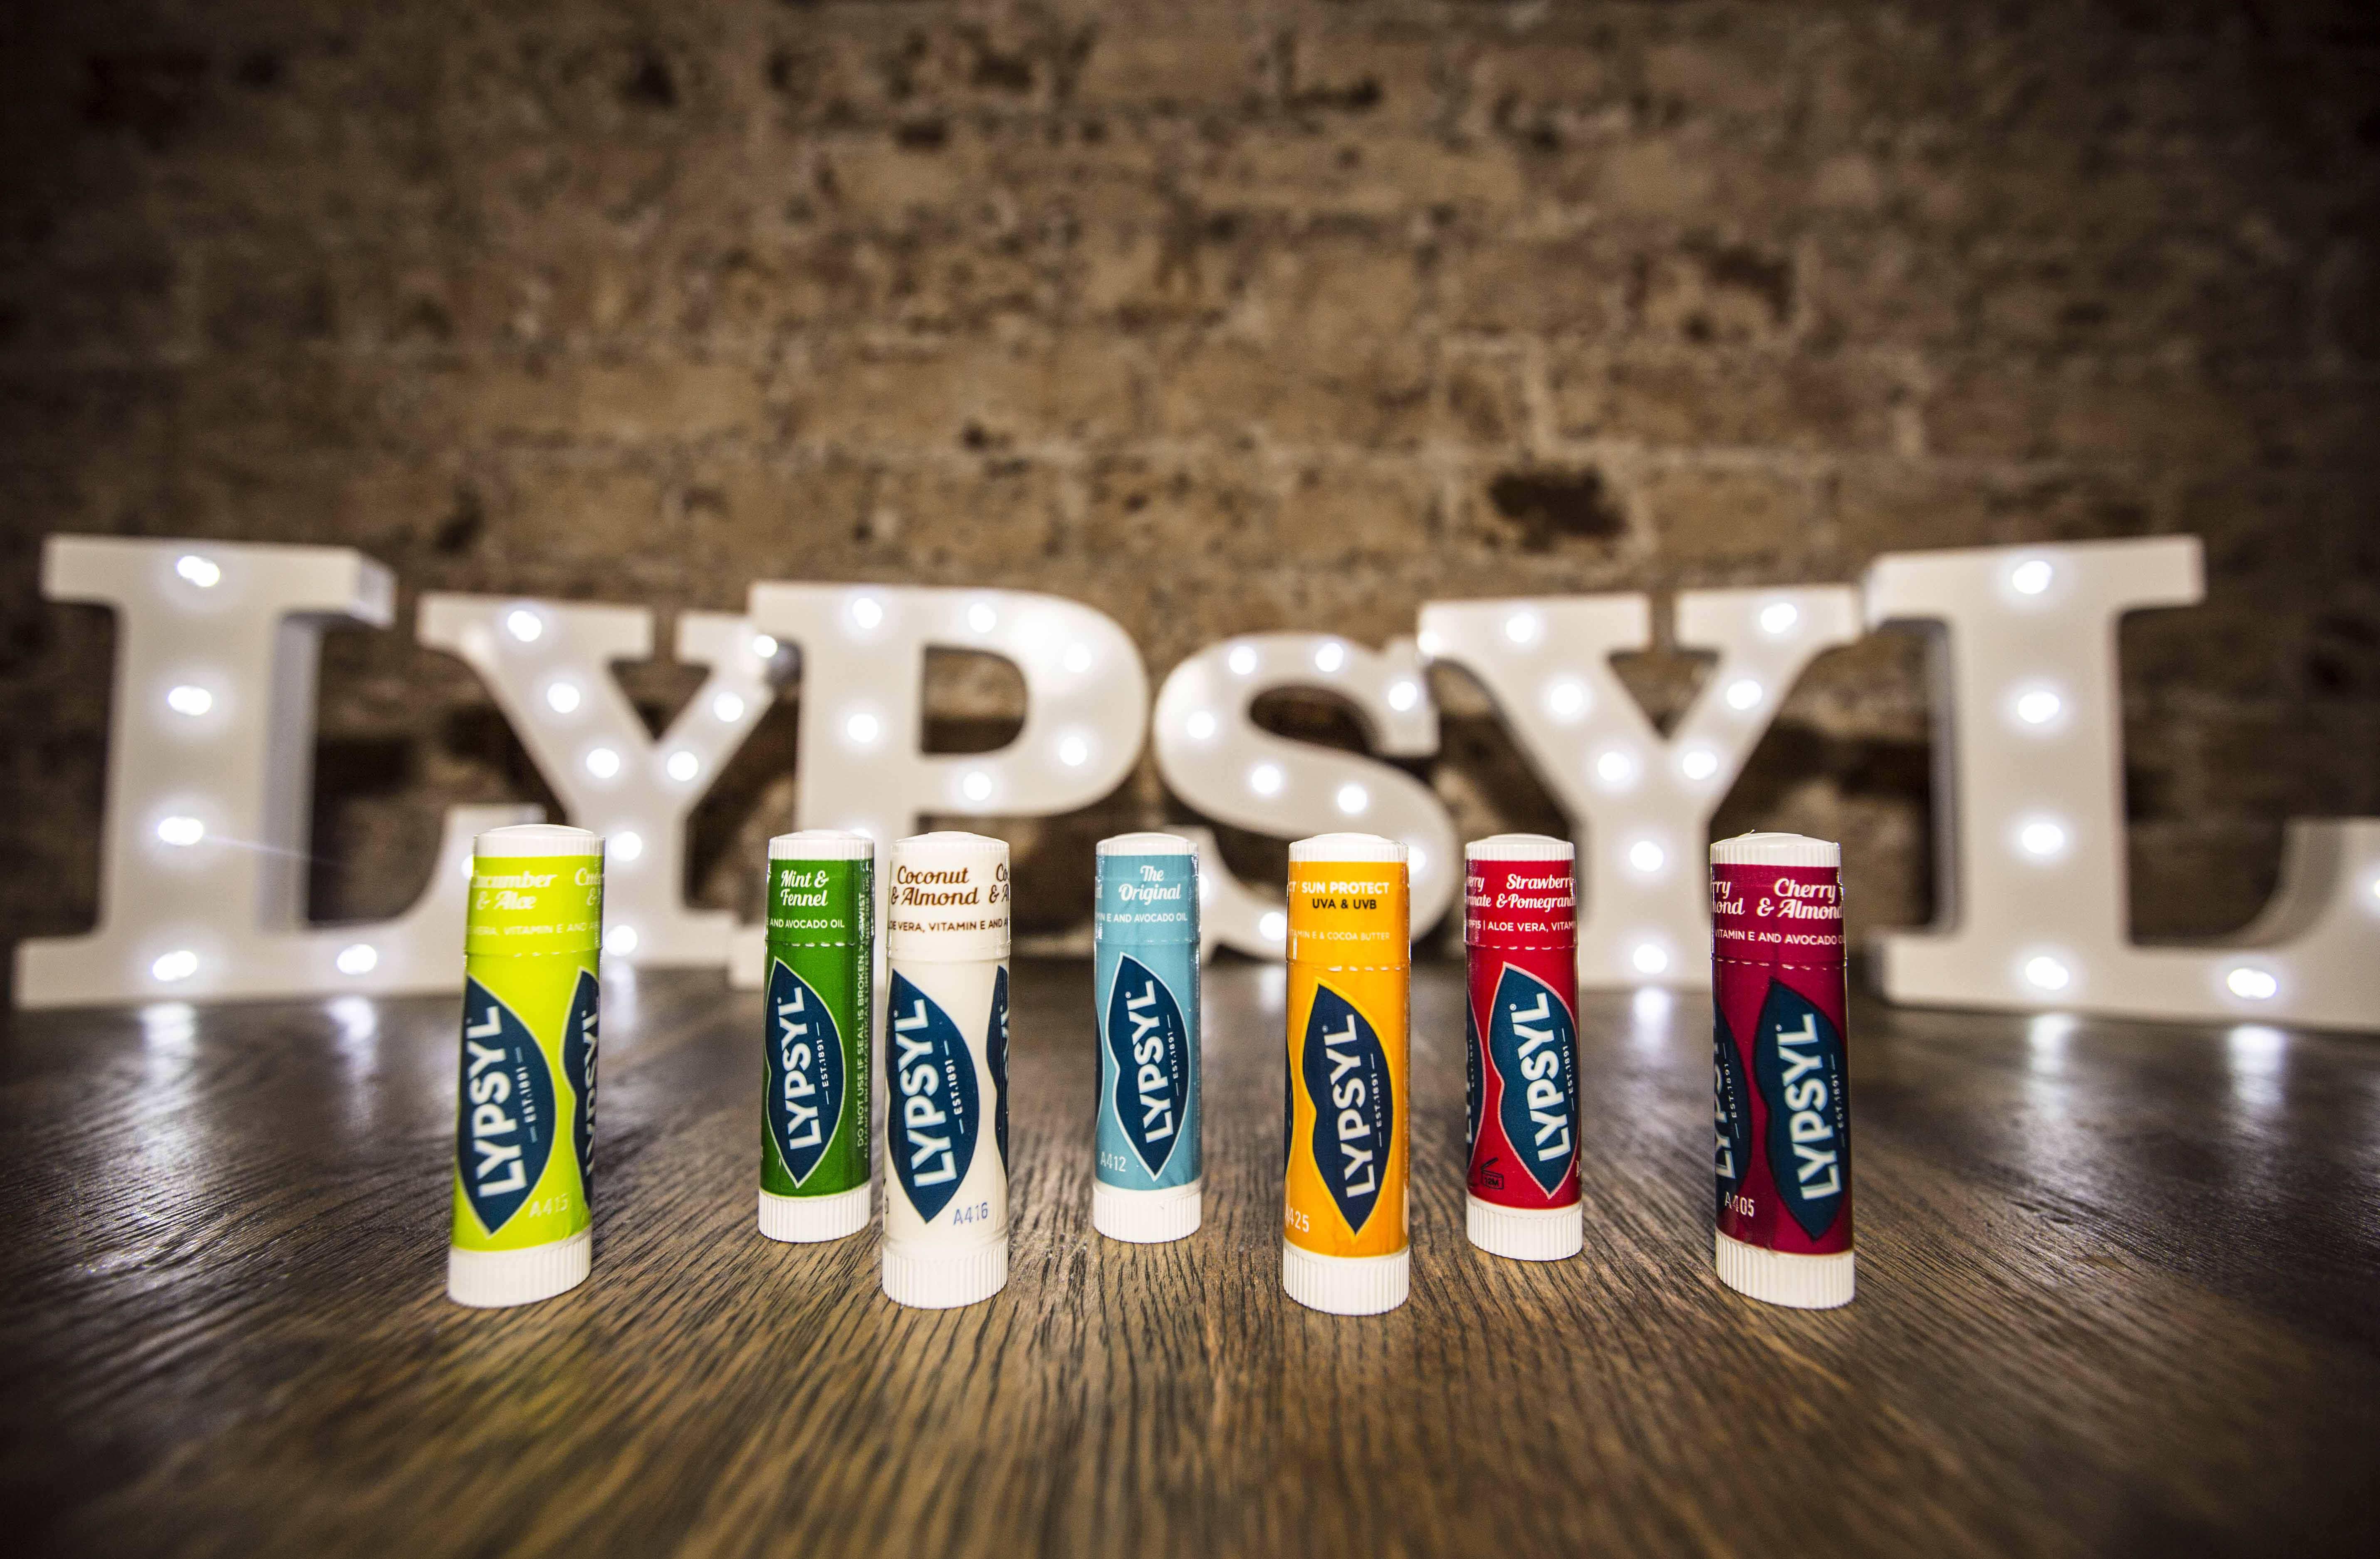 10 November 2016. Lypsyl VIP lip balm event. Artist Residence, London. Photographer: Rick Findler